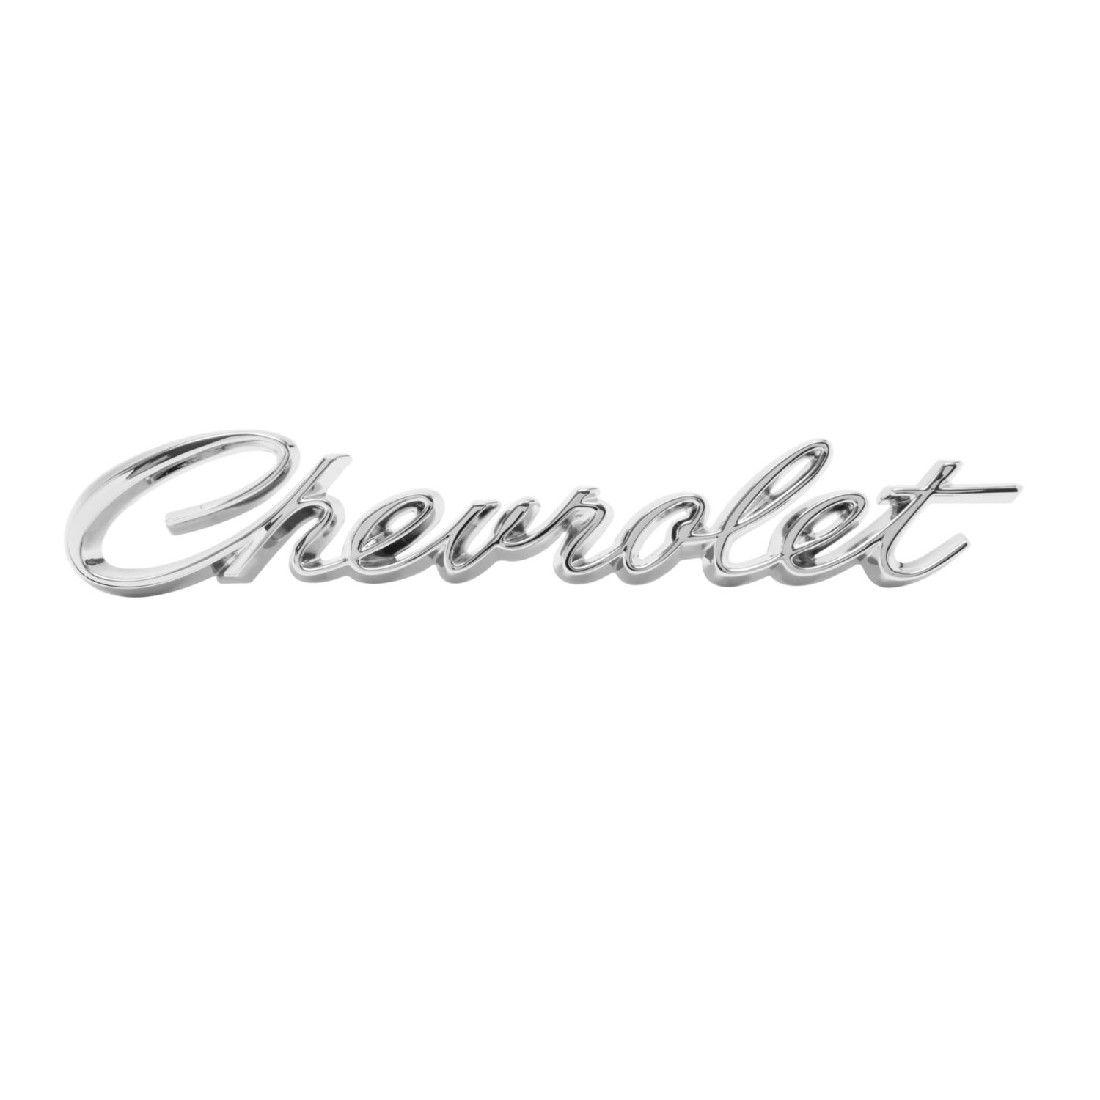 1968-1969 El Camino Chevrolet Tail Gate Emblem